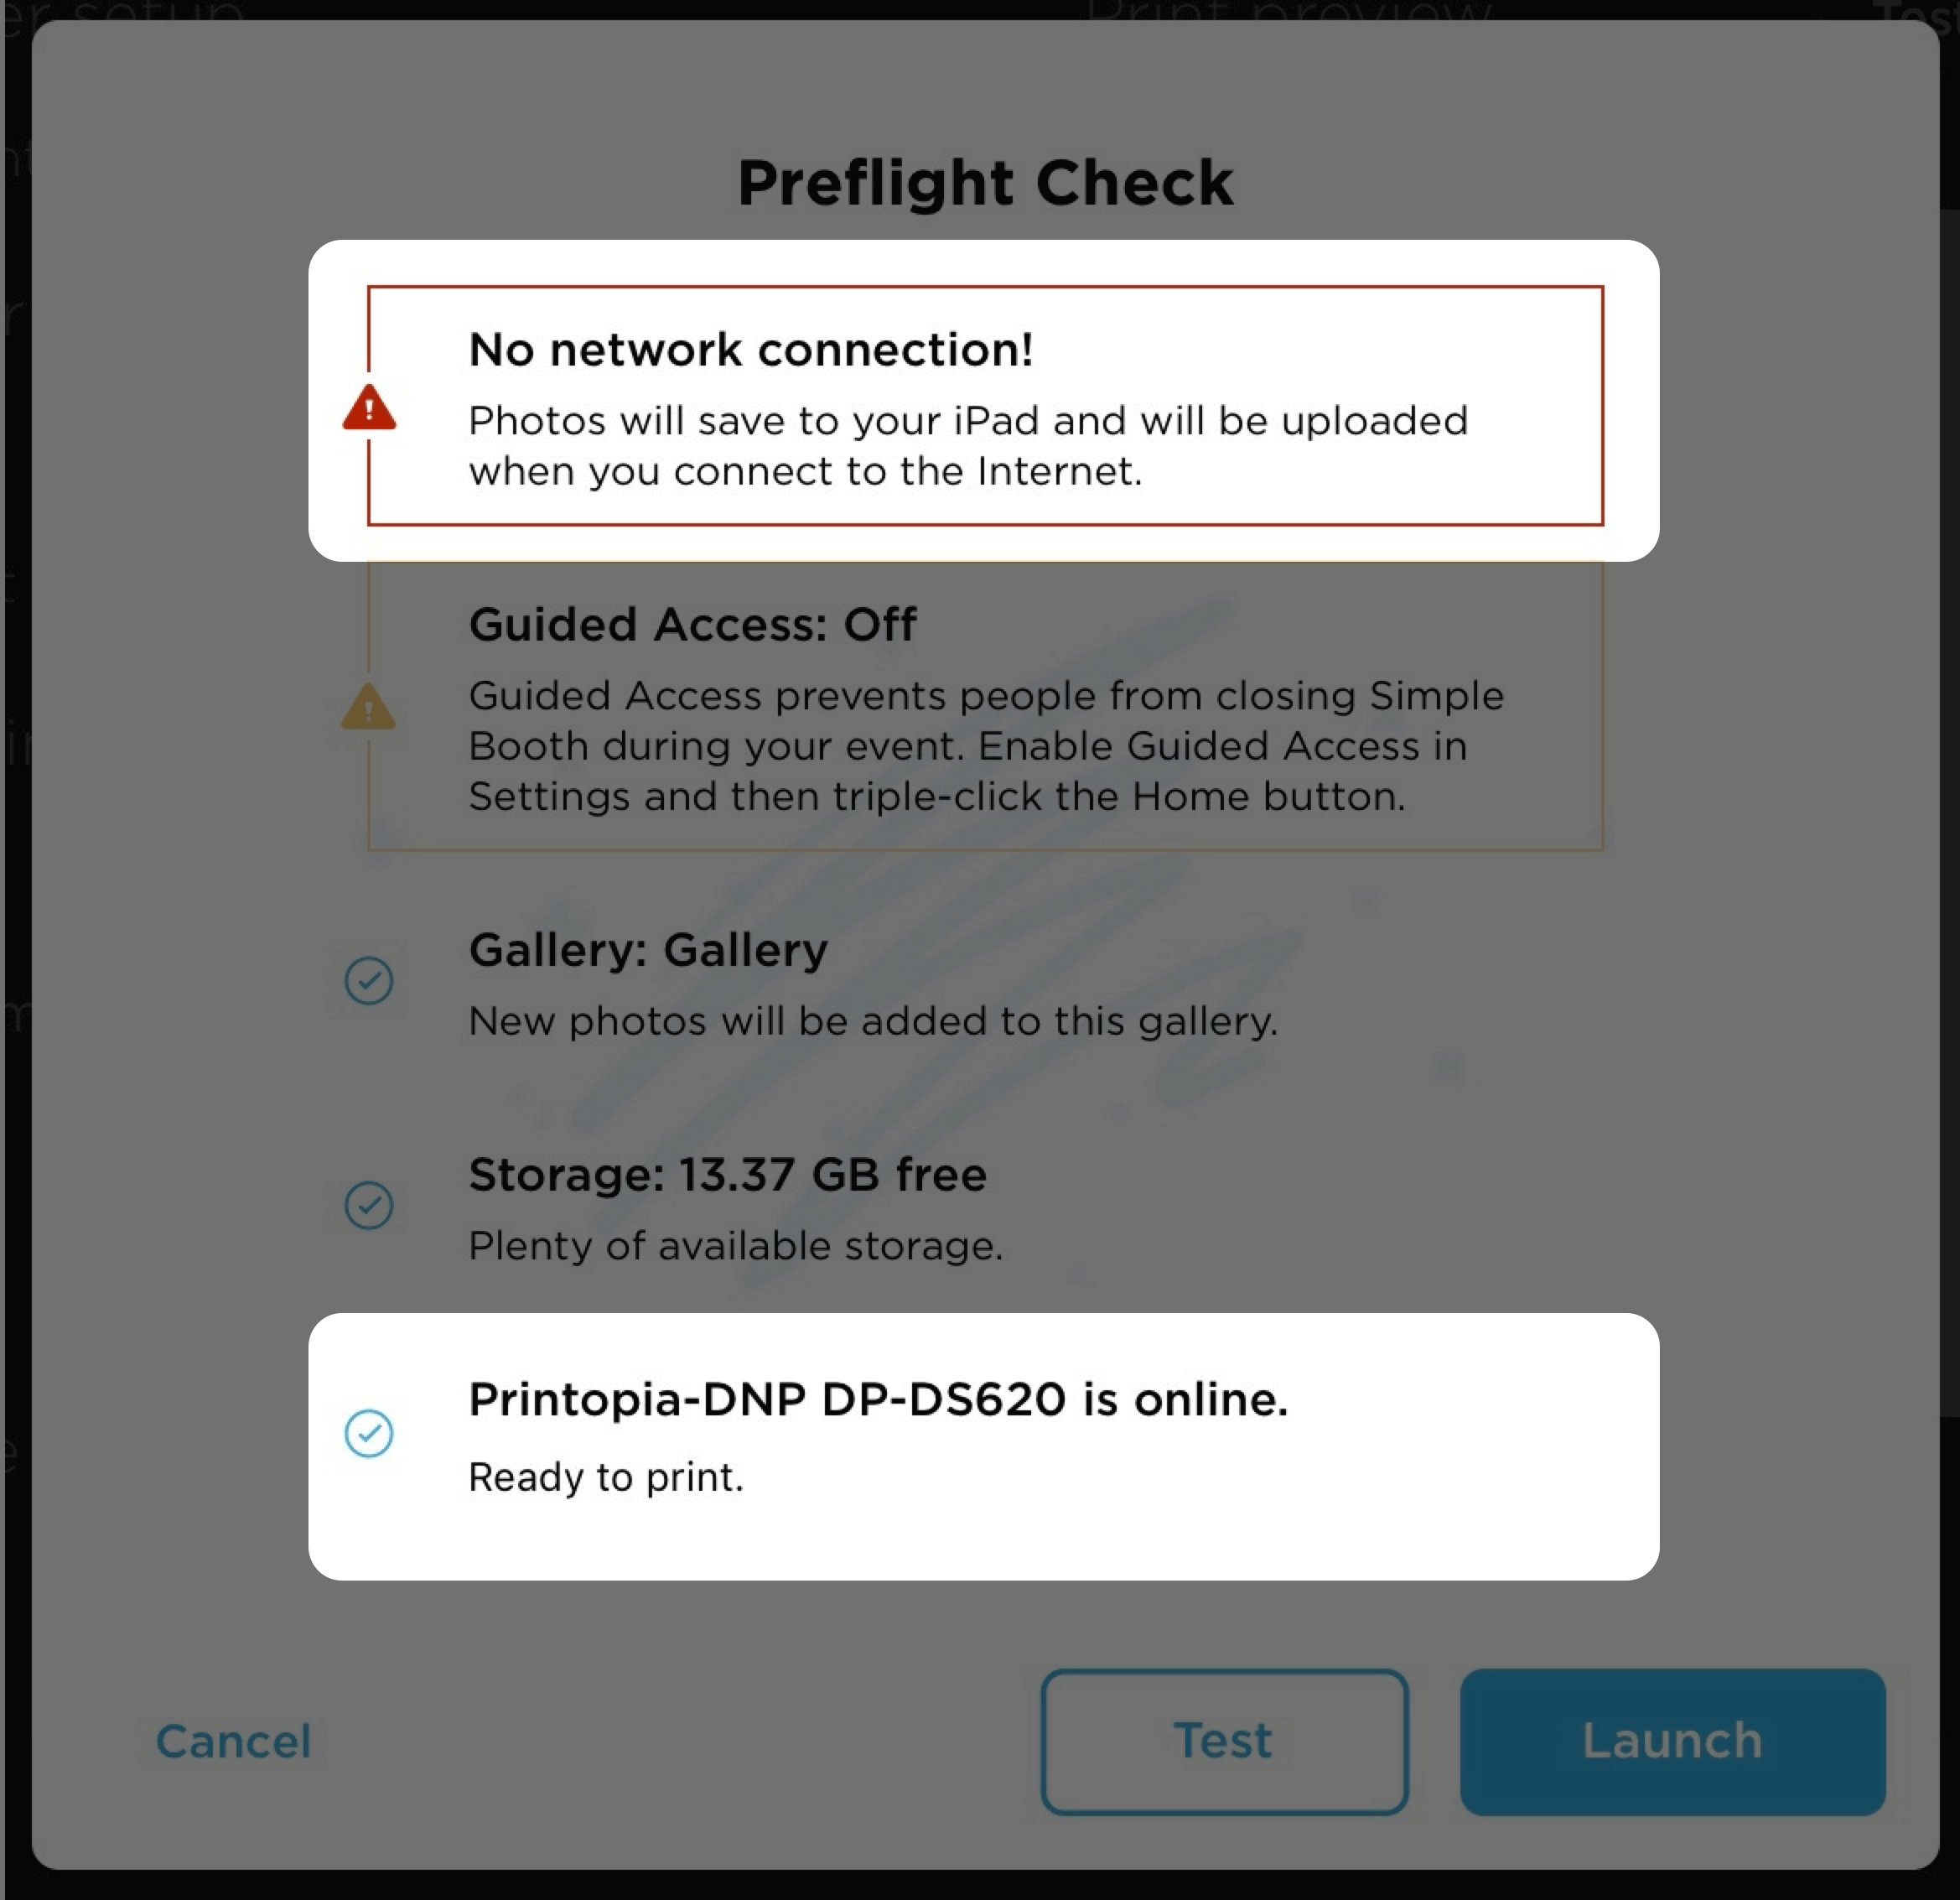 Preflight Check